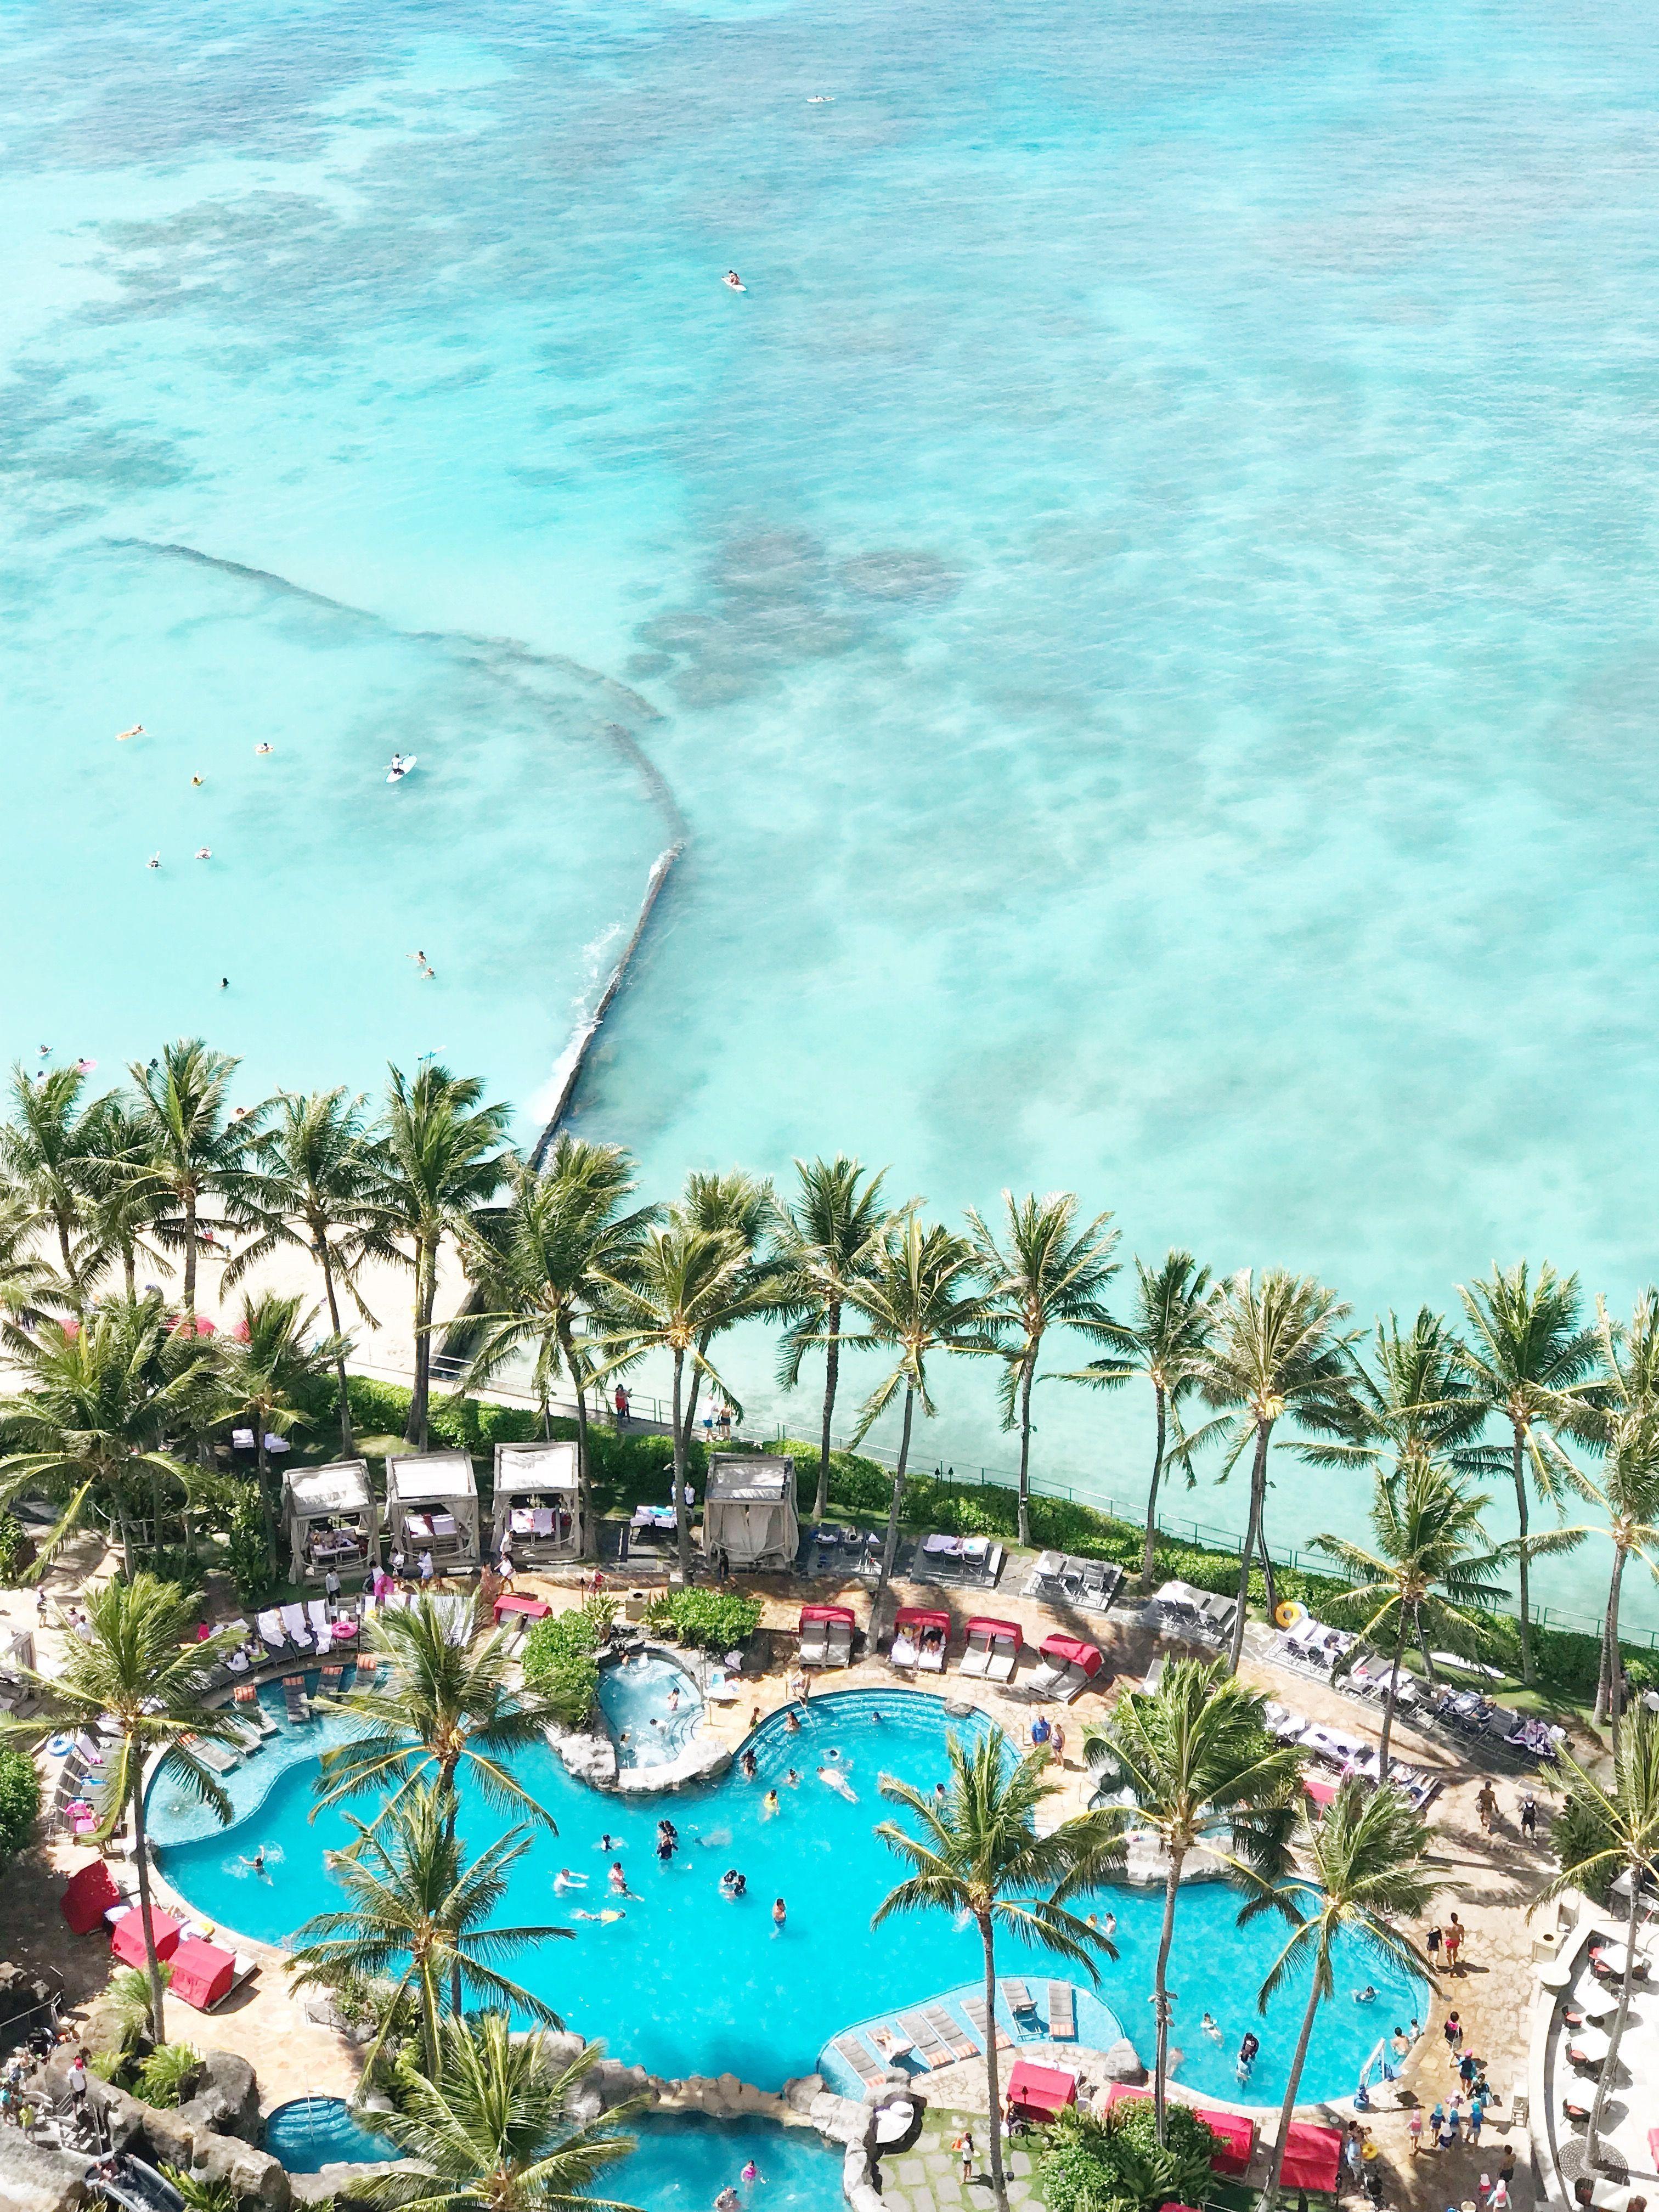 Our Stay At Sheraton Waikiki   Sheraton Hotels Hawaii   Sheraton Waikiki  Room   Sheraton Waikiki Resort   Honolulu Hotels   Oahu Hotels   Hawaii  Hotel ...